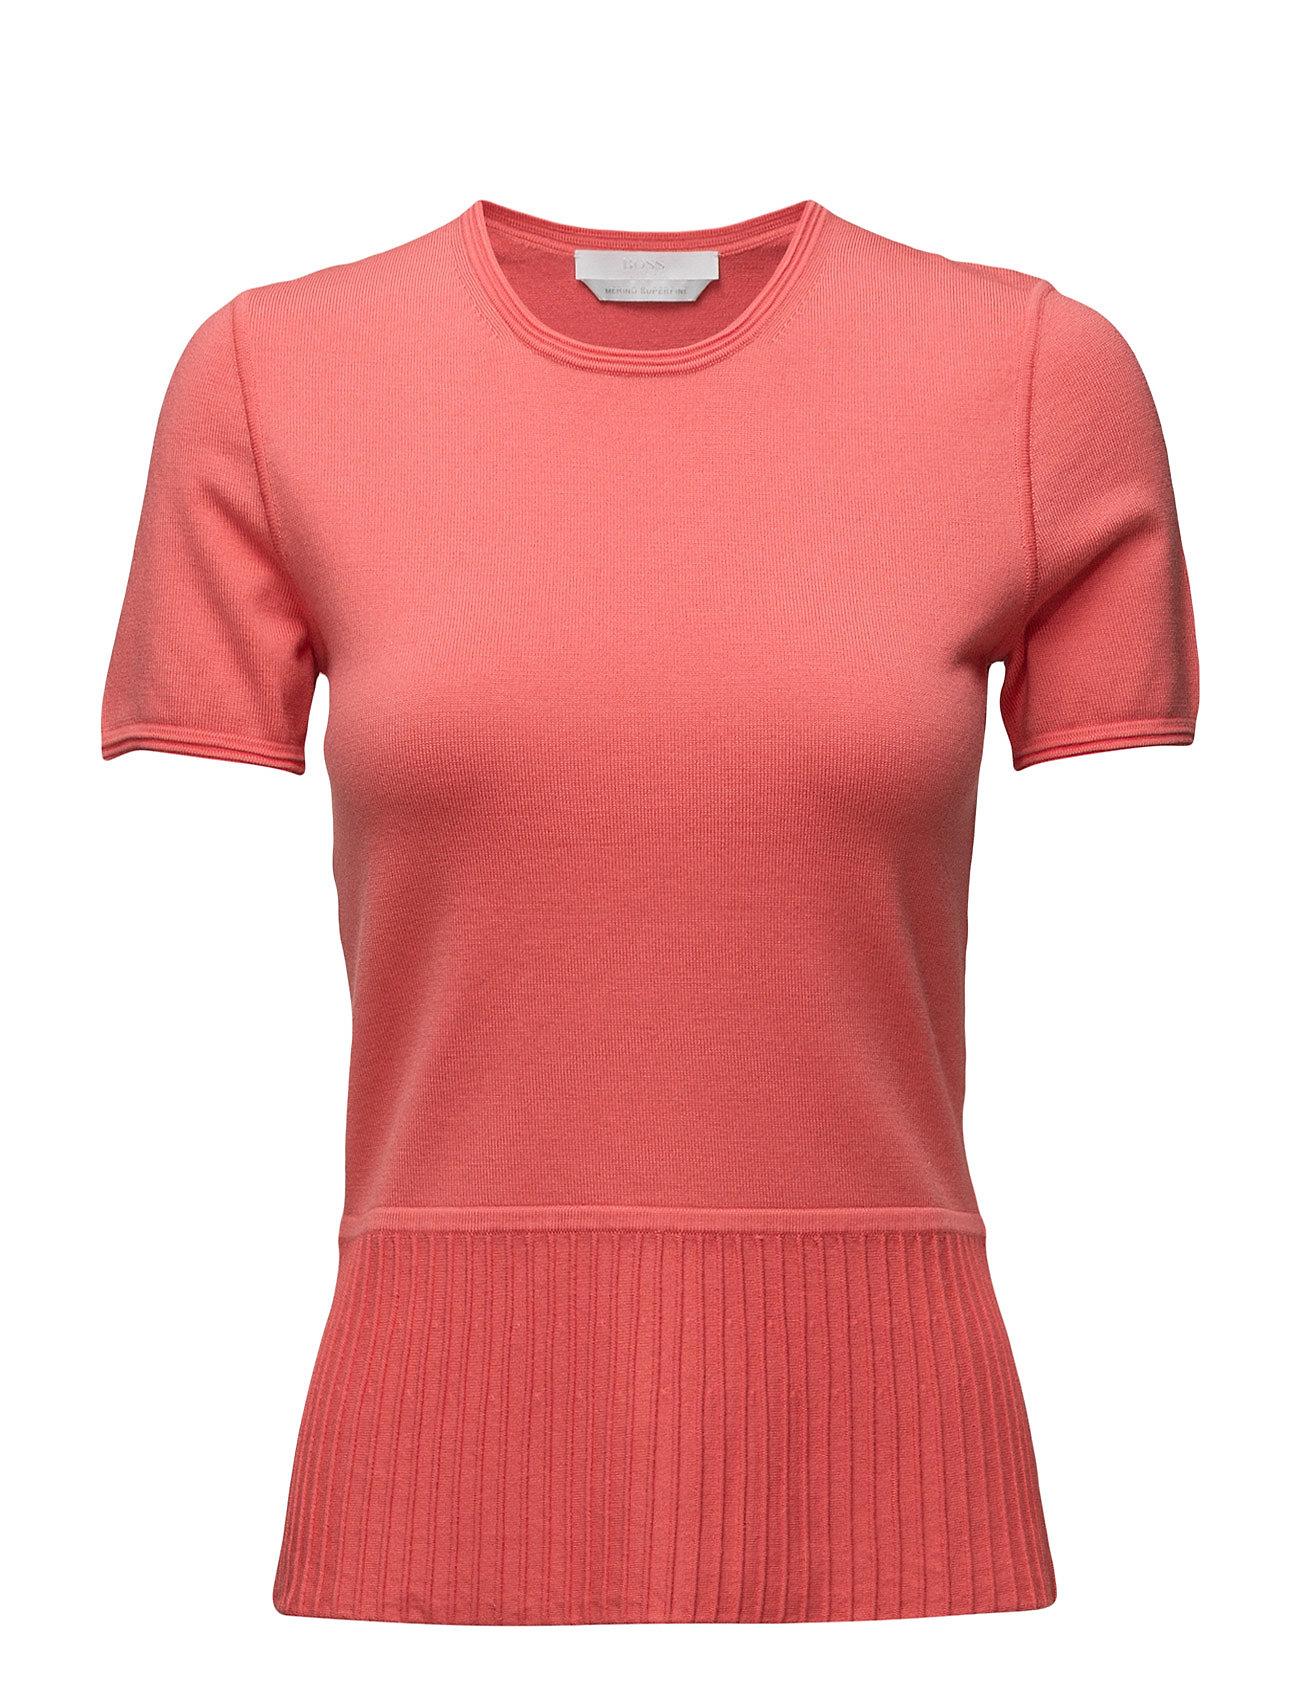 Faly BOSS Sweatshirts til Kvinder i Medium Pink